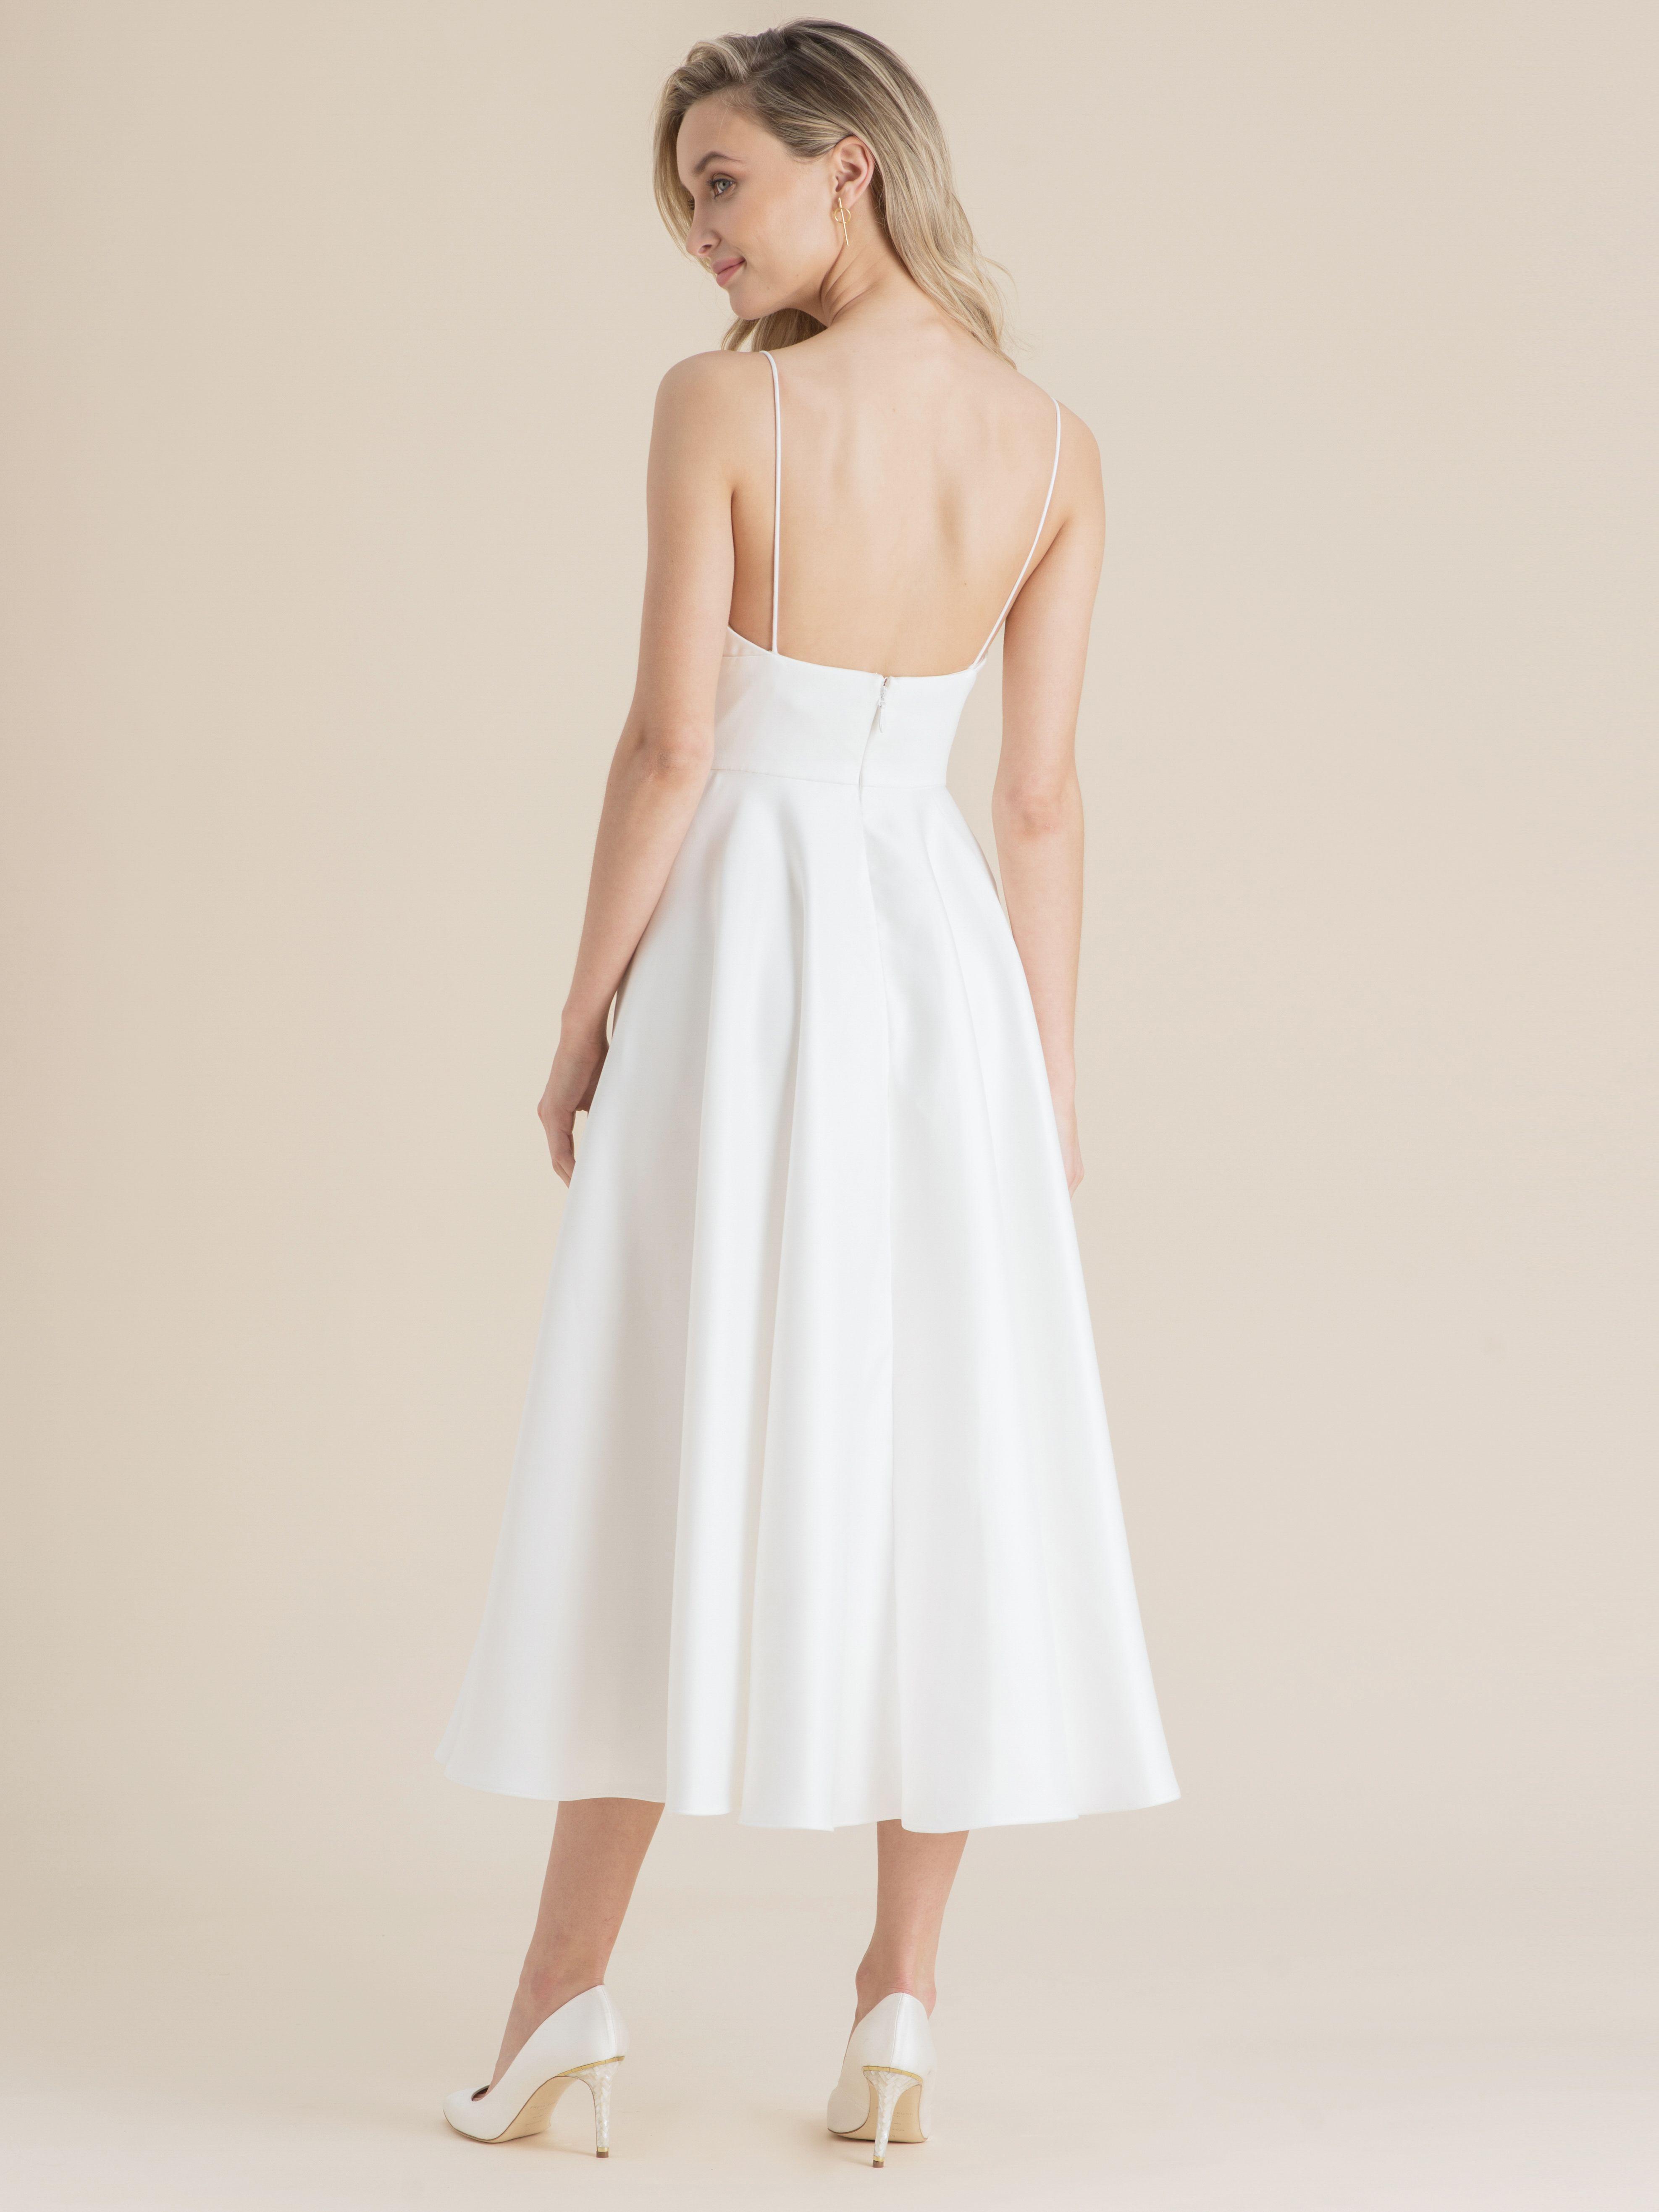 Luna Dress (With images) Mid length wedding dresses